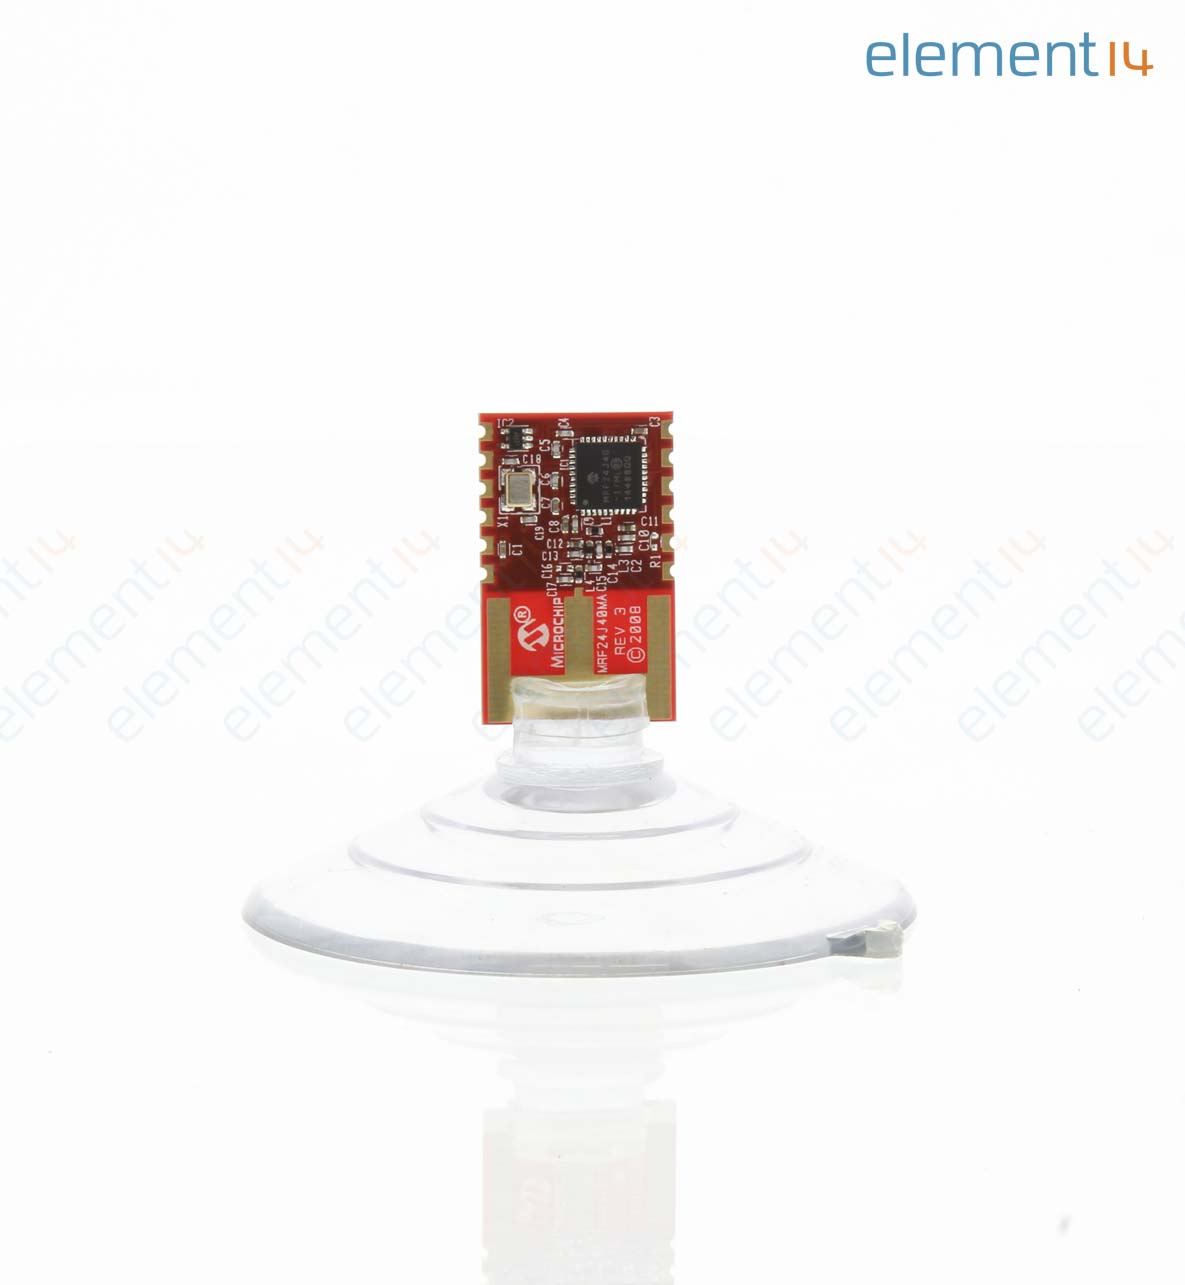 Mrf24j40ma I Rm Microchip Rf Transceiver Radio Module 250kbps Pcb Wireless Testing A Pt2262based Remote Control Element14 Richmedia 9400b En